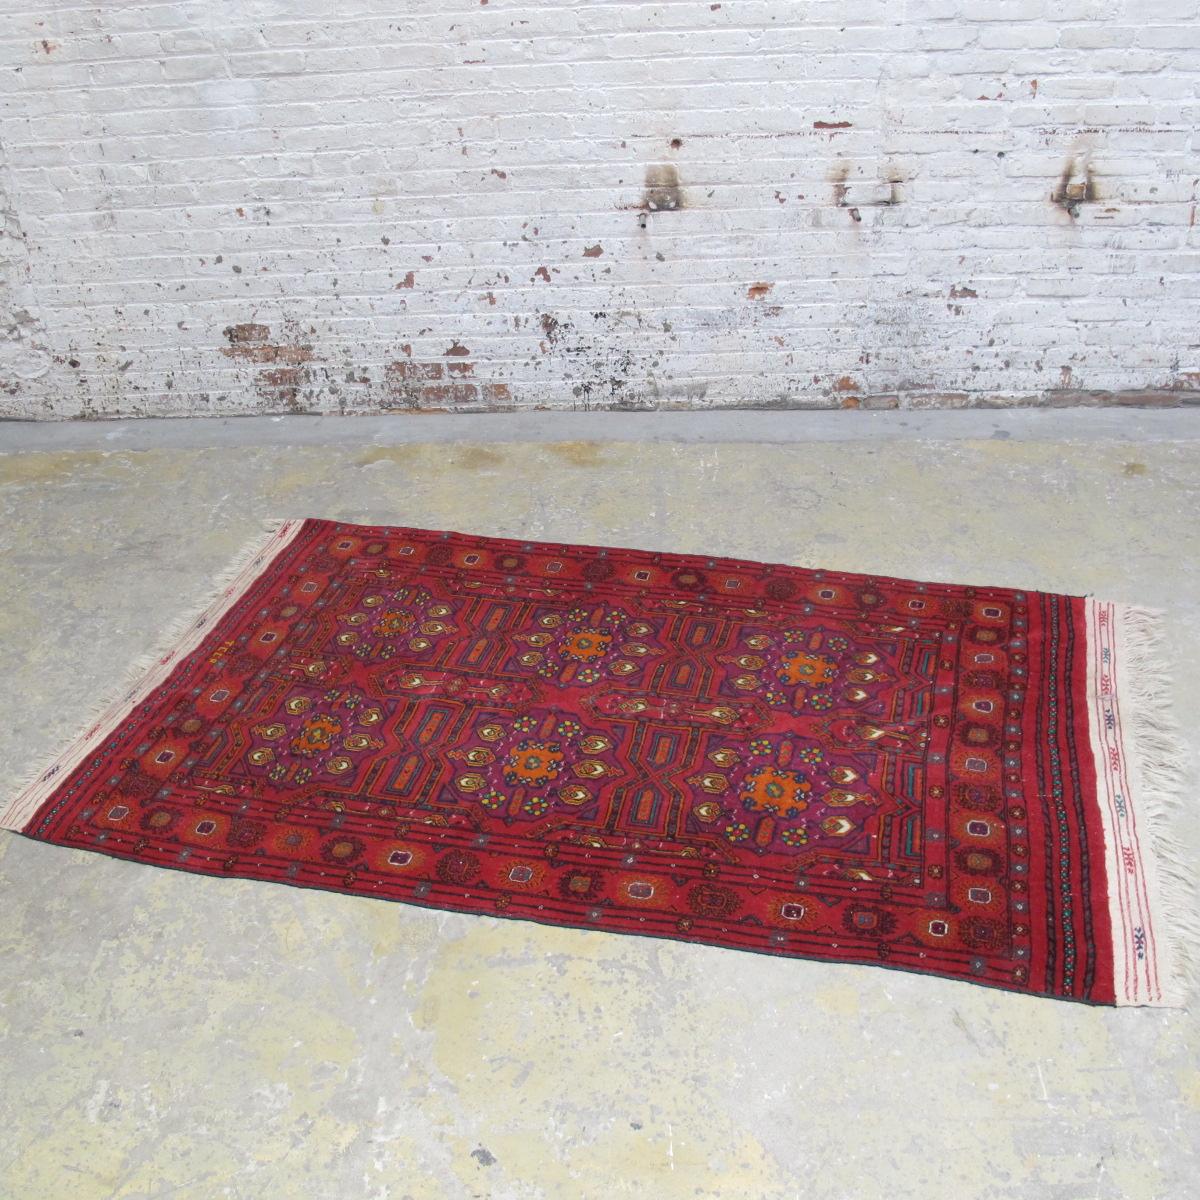 Red Patterned Rug $200